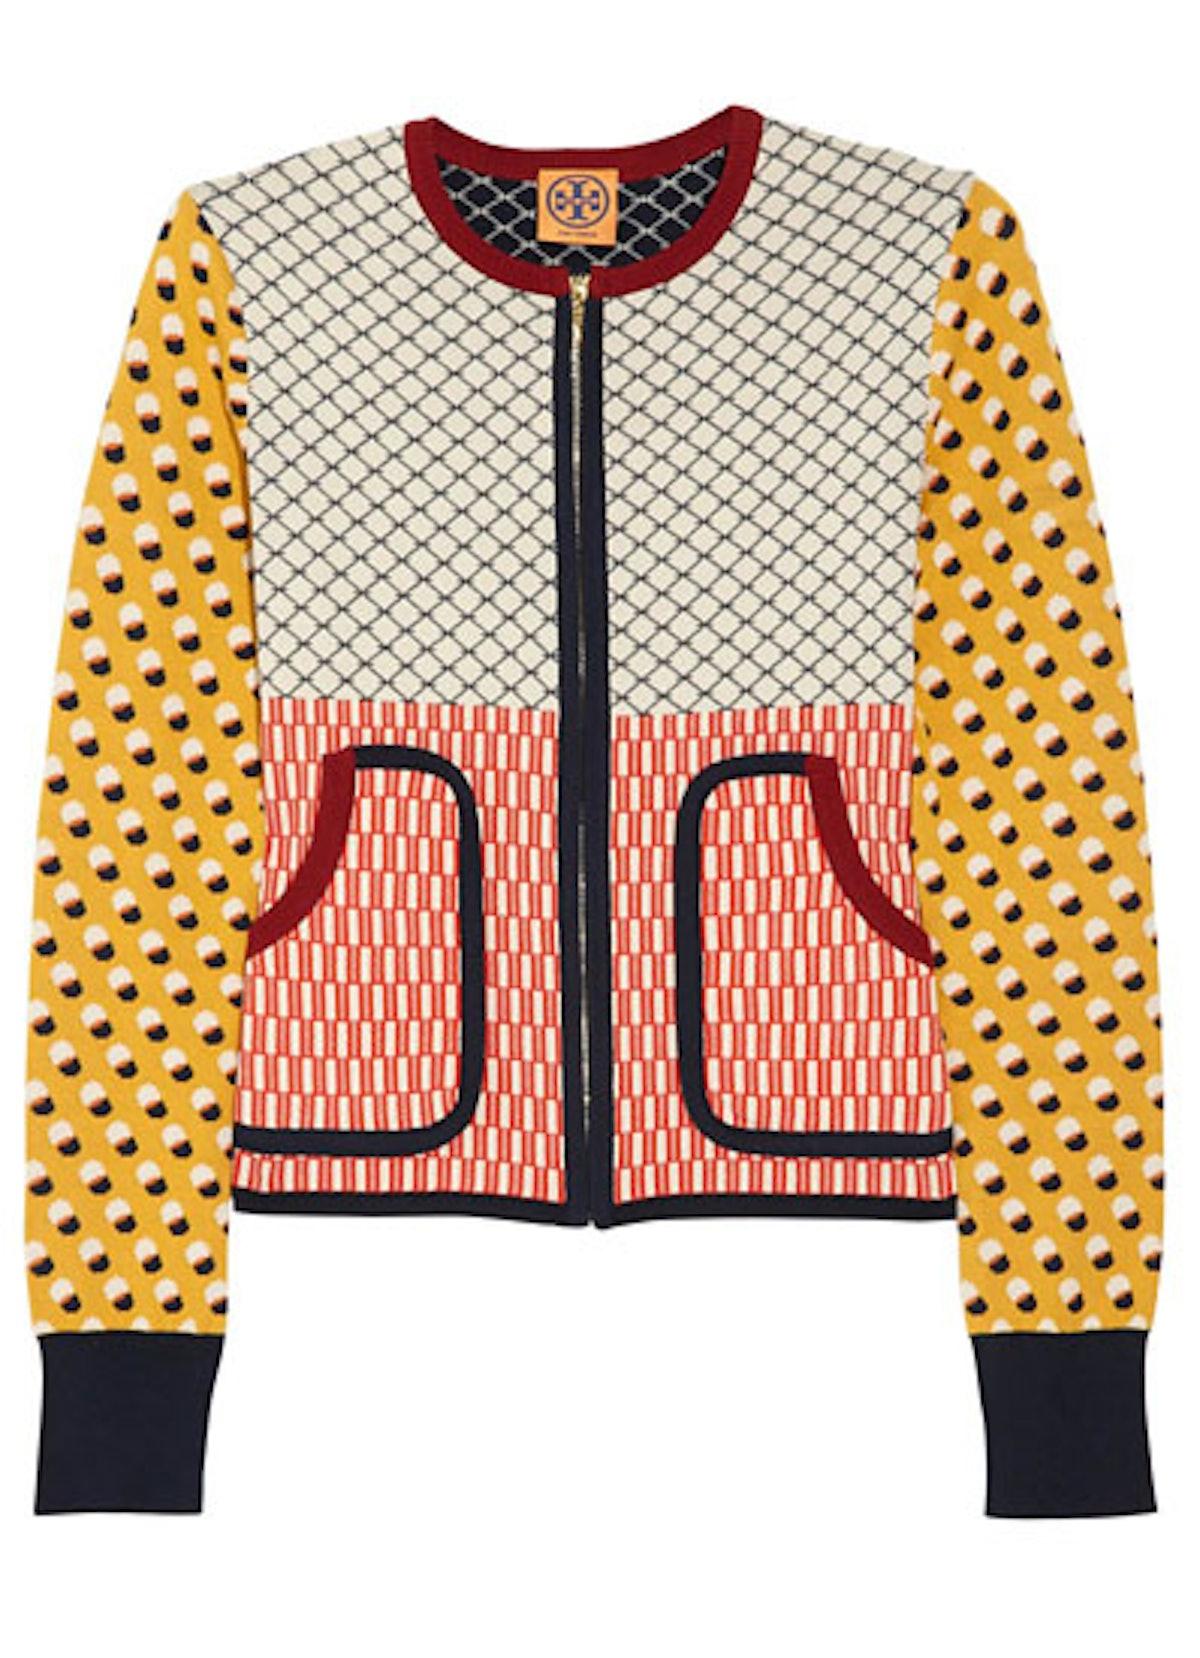 fass-graphic-knits-08-v.jpg